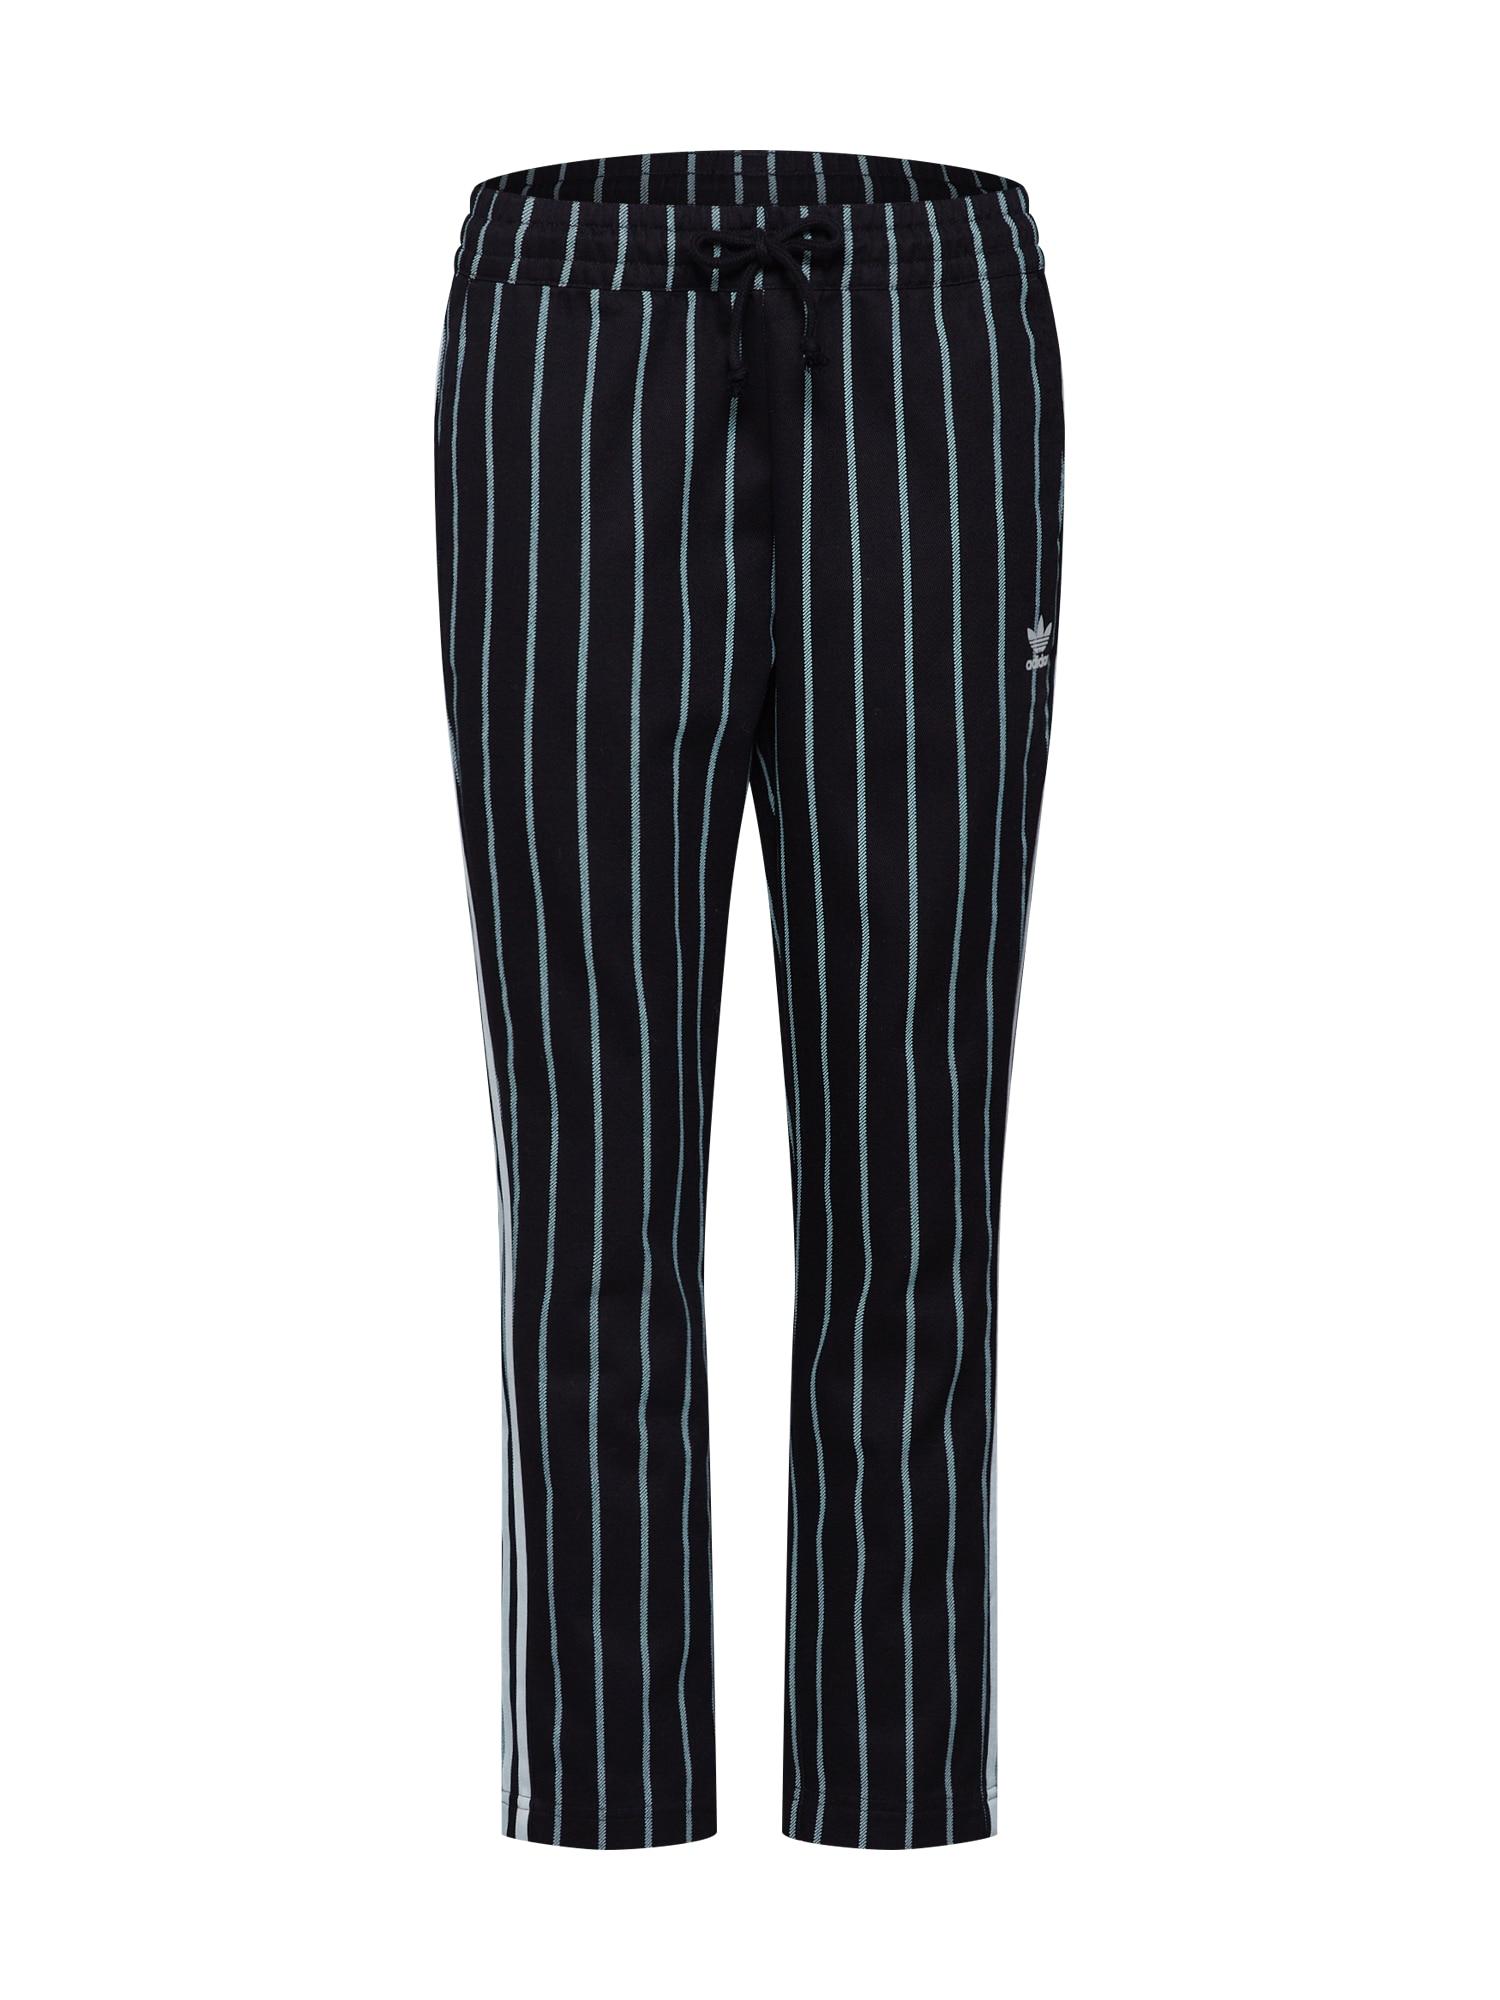 Kalhoty TRACK PANTS grün schwarz ADIDAS ORIGINALS